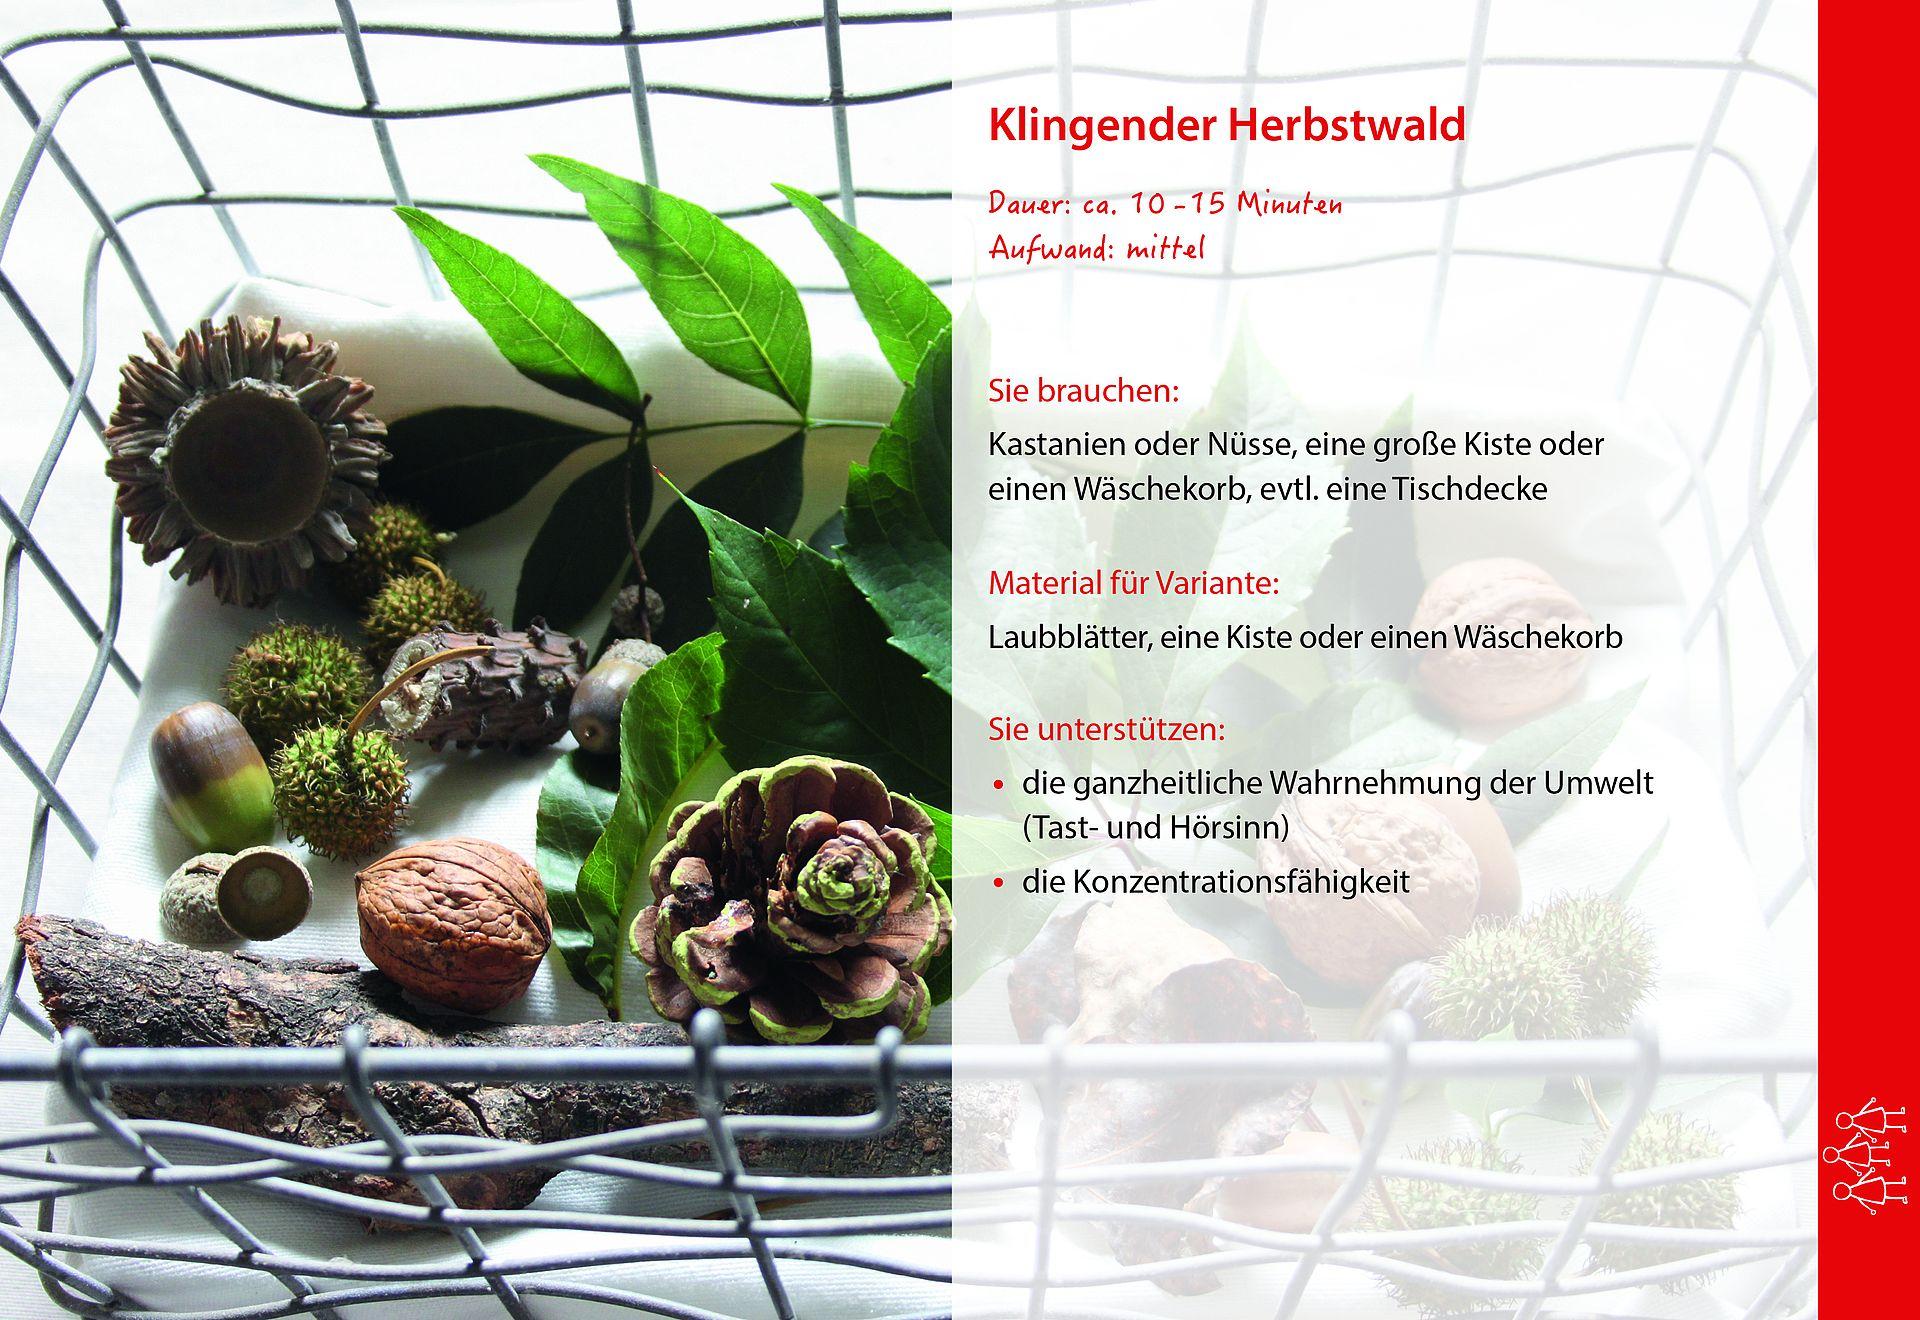 Ohrenspitzer Methodenkarte: Klingender Herbstwald